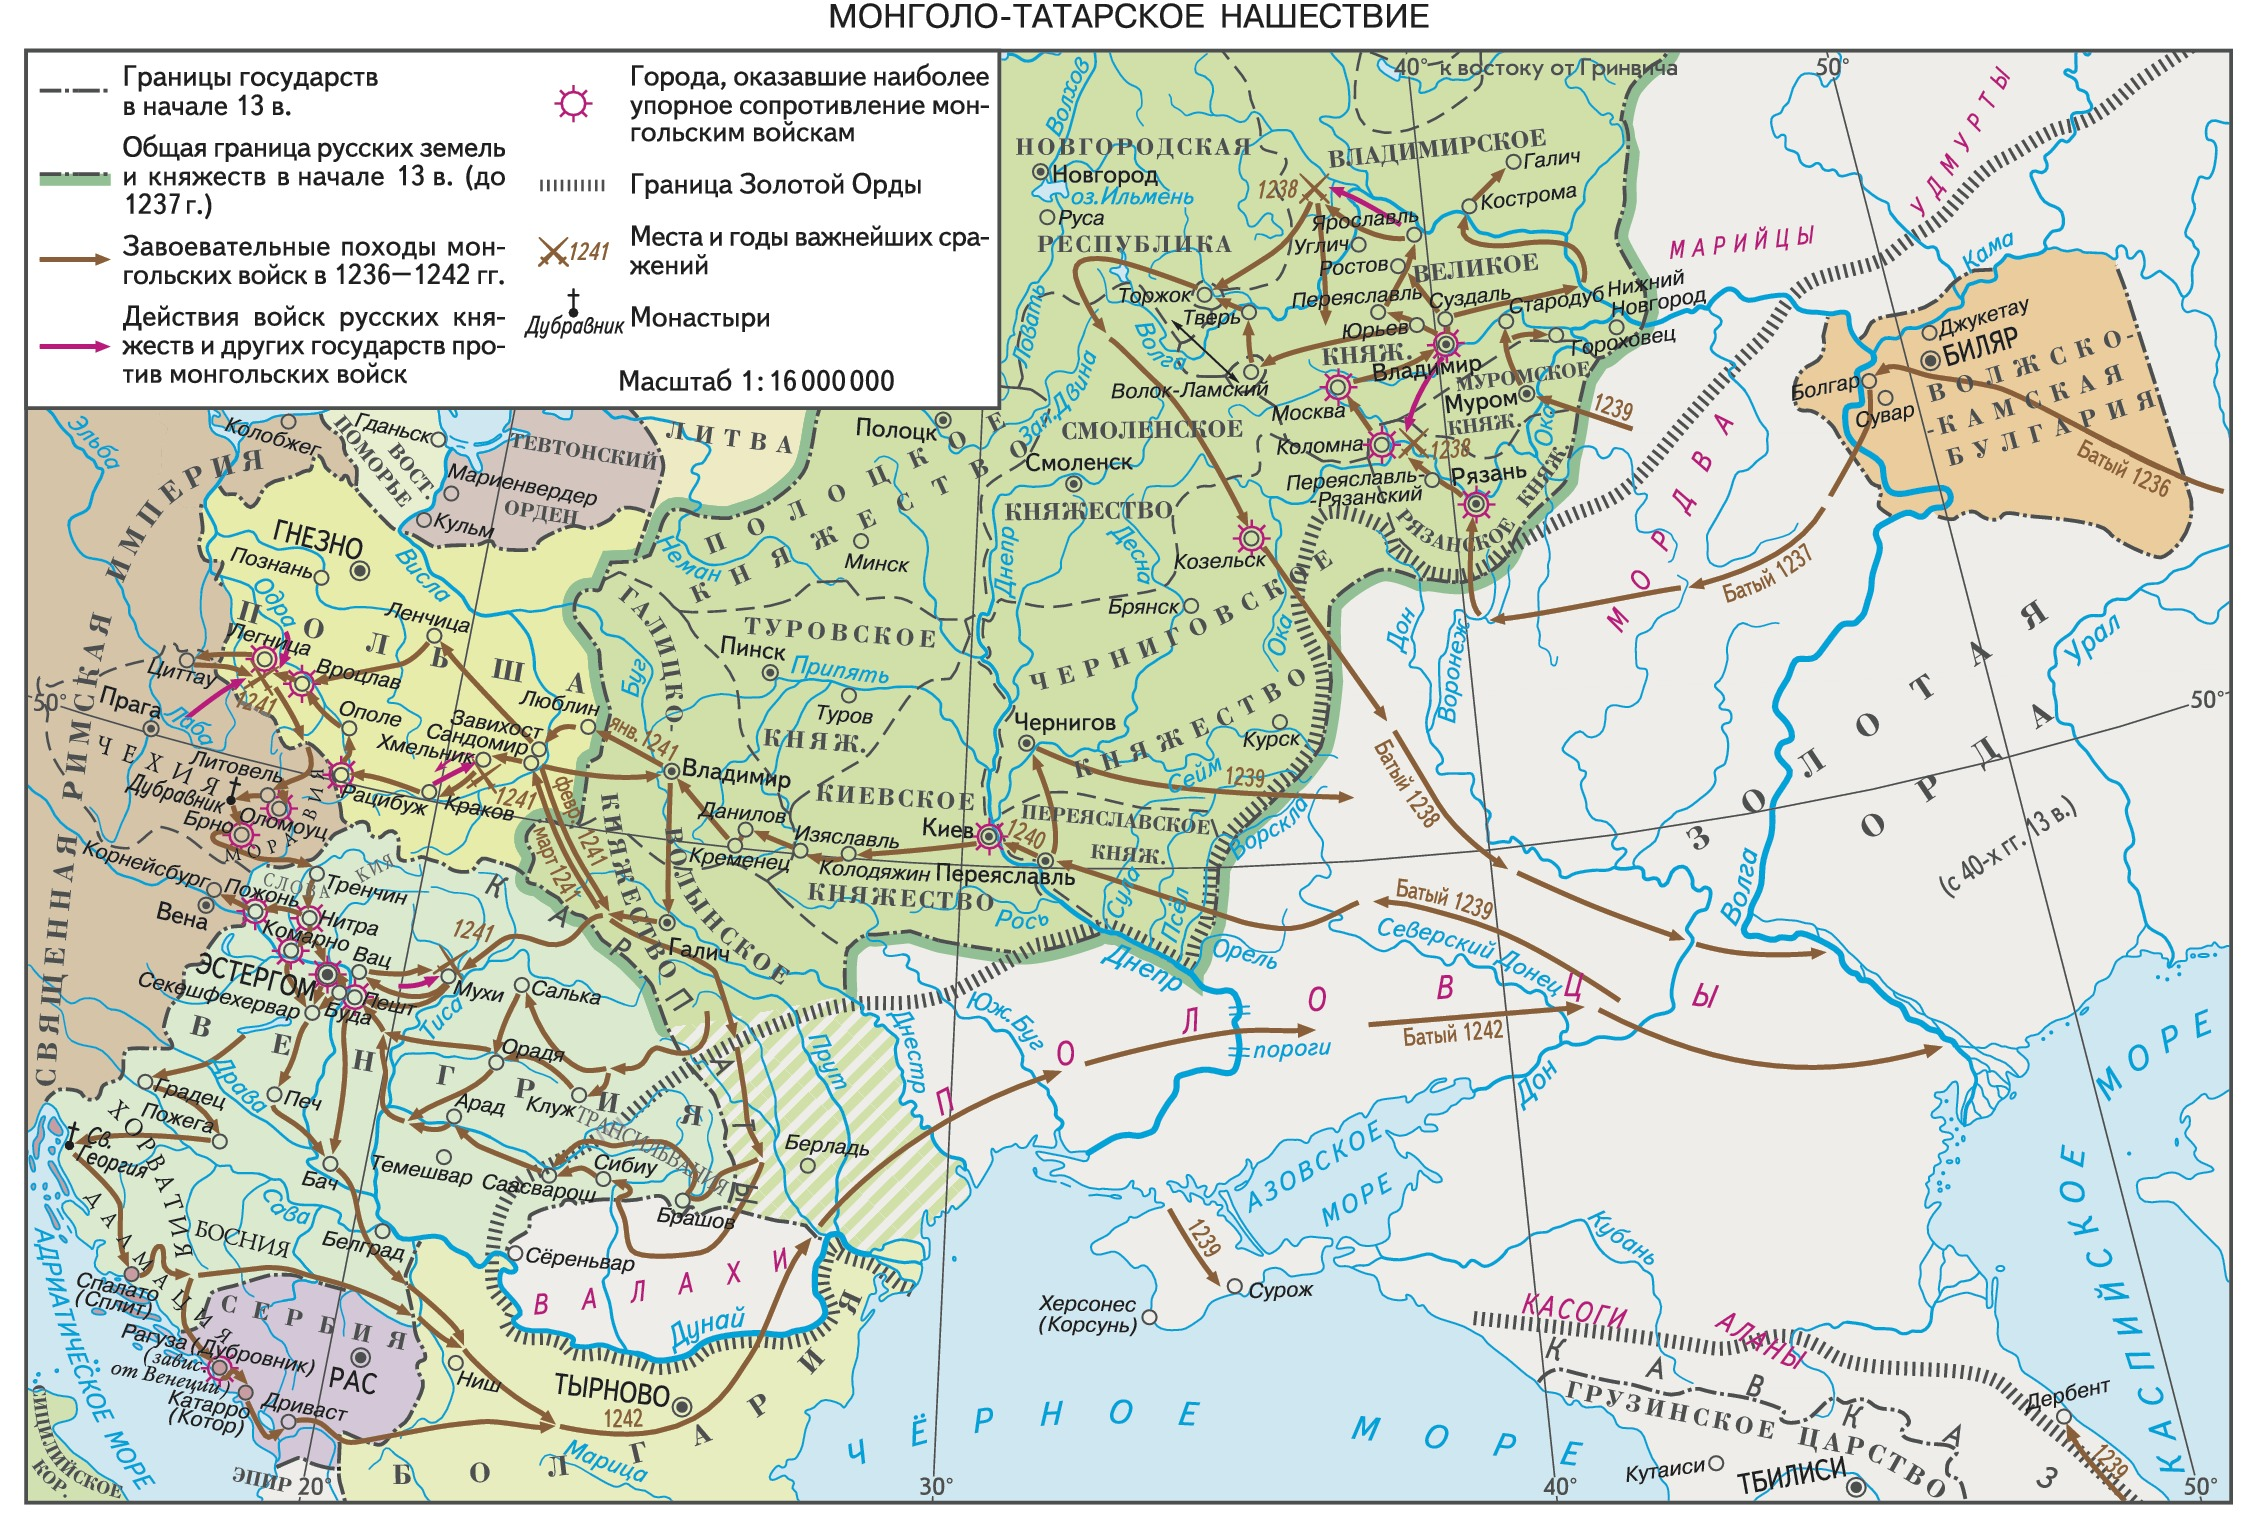 взятие татарами владимира